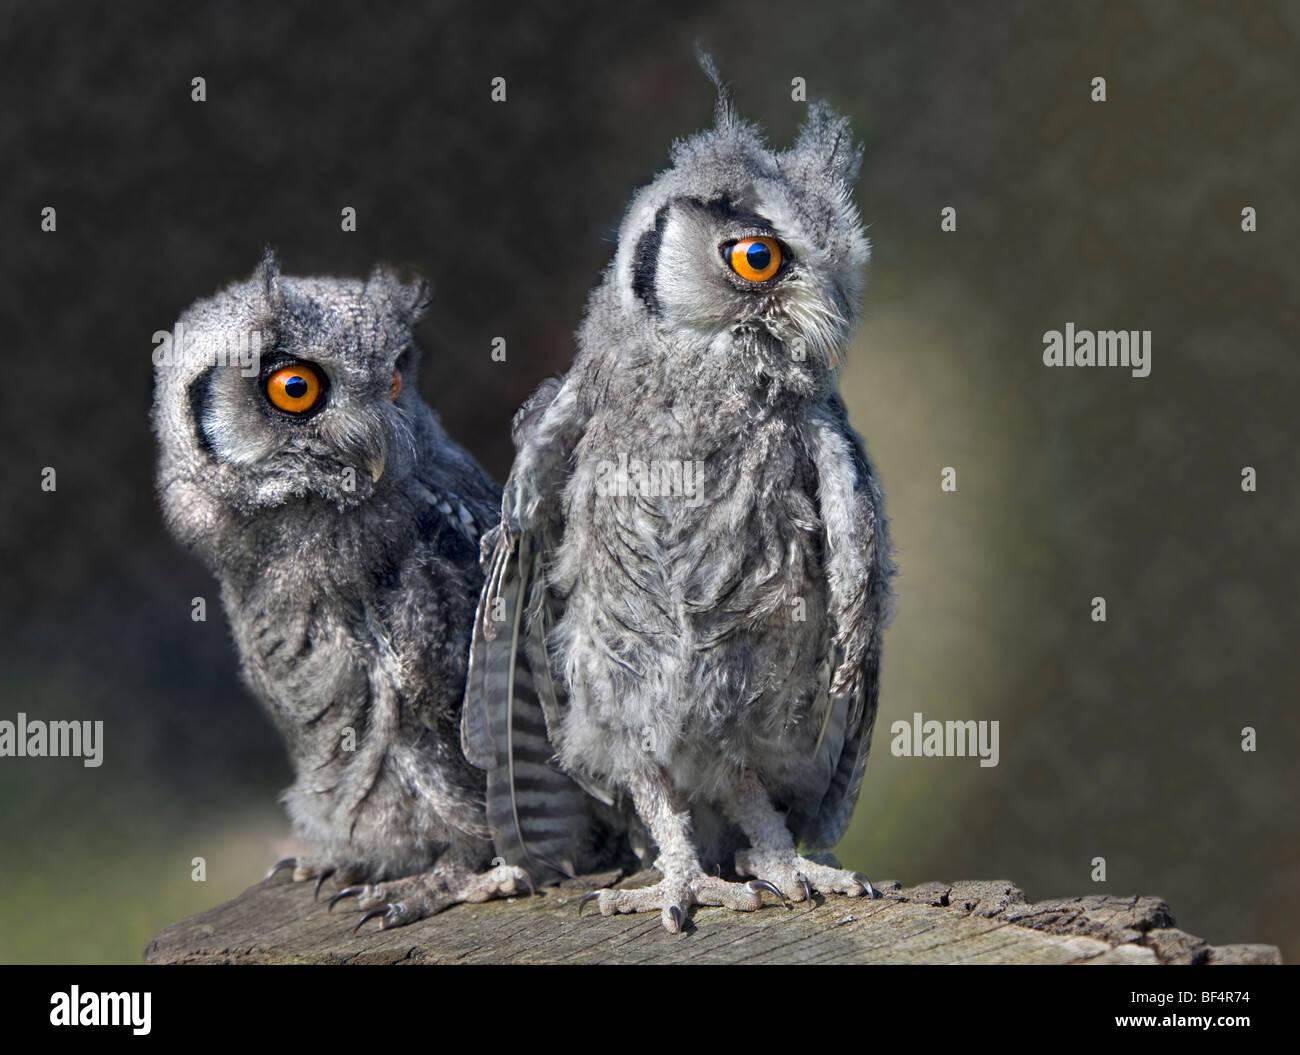 Weißen konfrontiert Zwergohreule Eule Jungvögel (Ptilopsis Leucotis) Stockbild